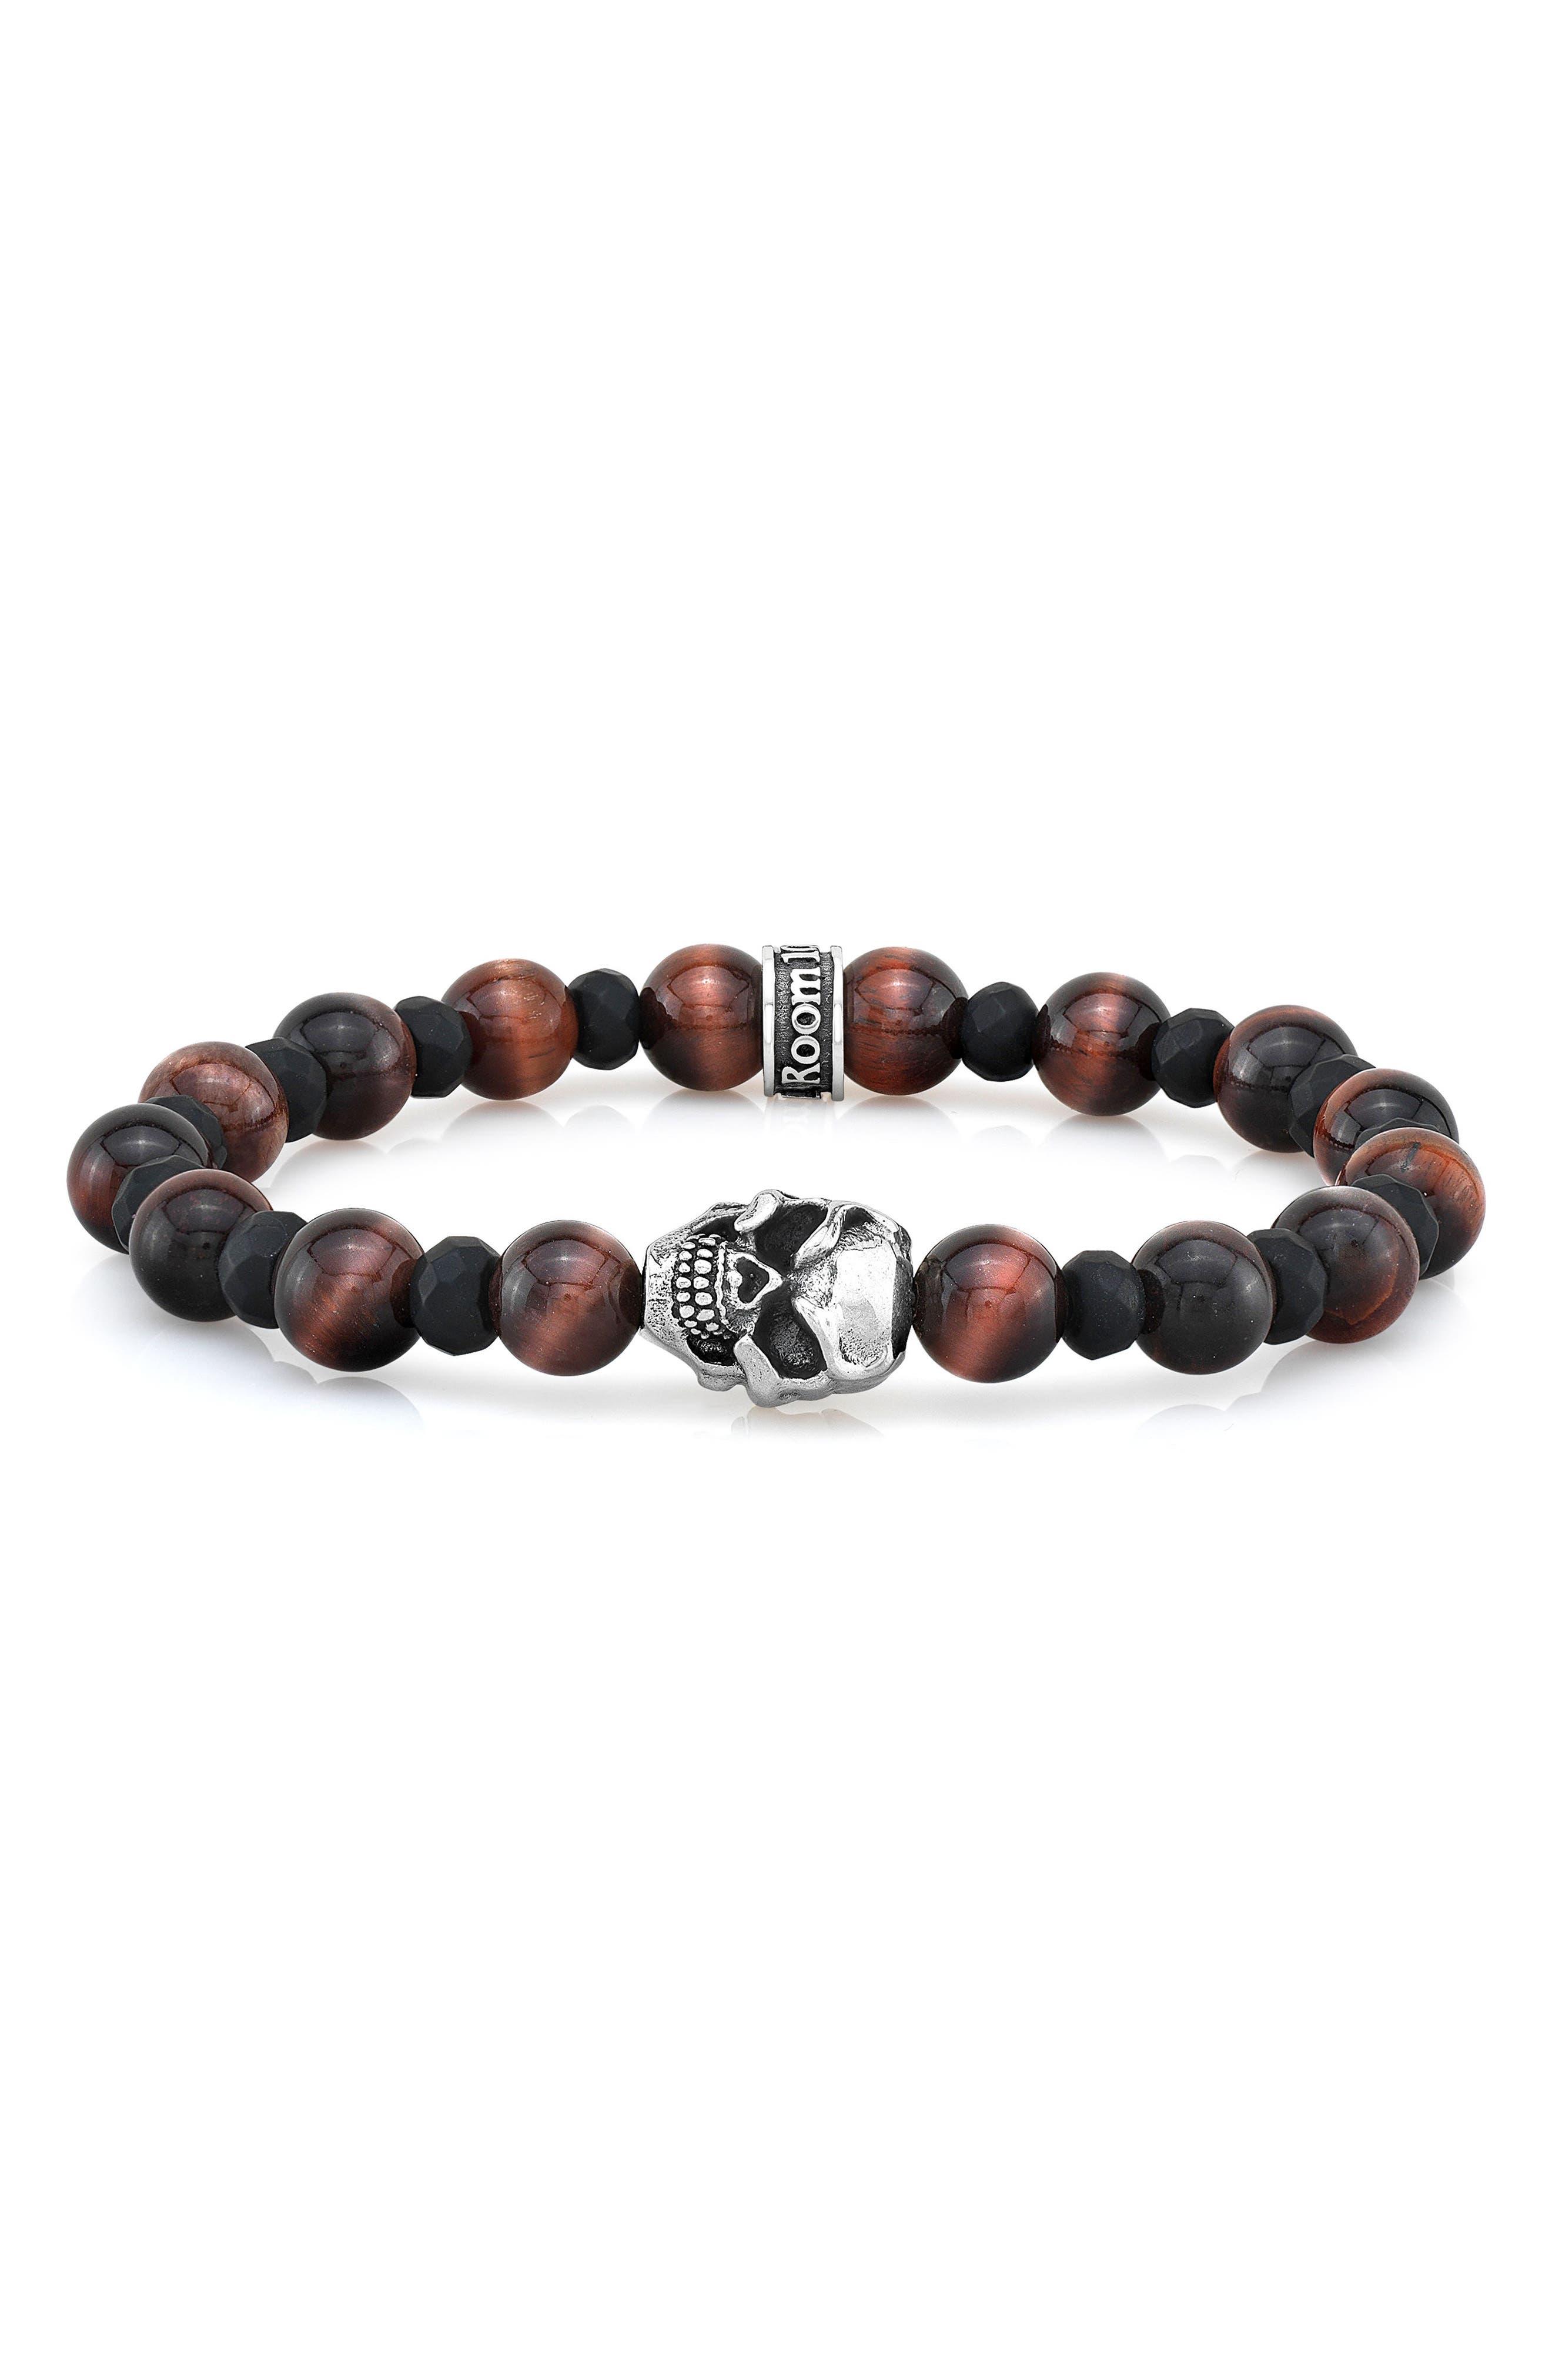 Tiger's Eye & Agate Bead Bracelet,                             Main thumbnail 1, color,                             Red/ Black